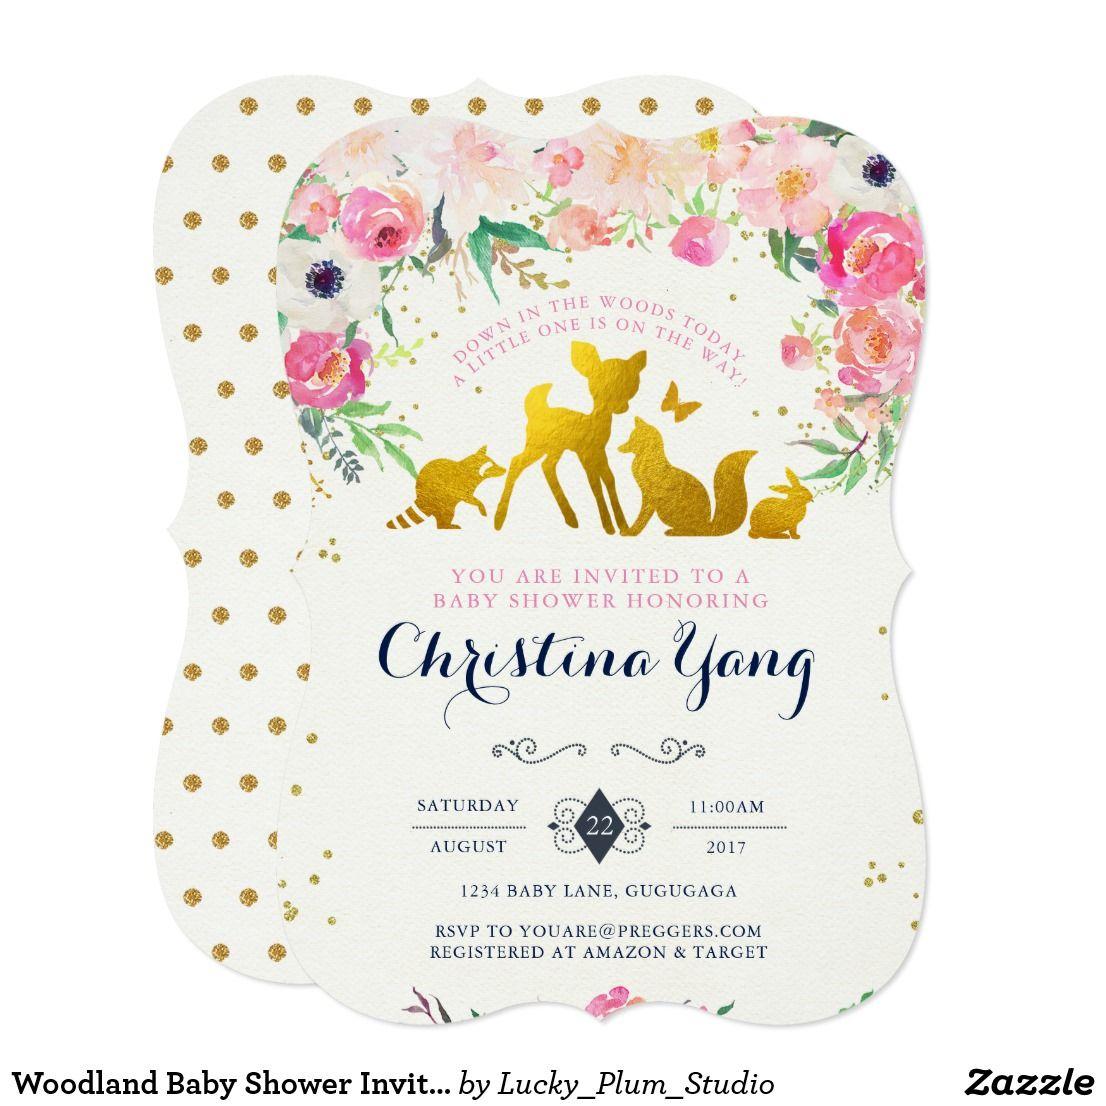 Woodland Baby Shower Invitation   Party Time   Pinterest   Woodland ...